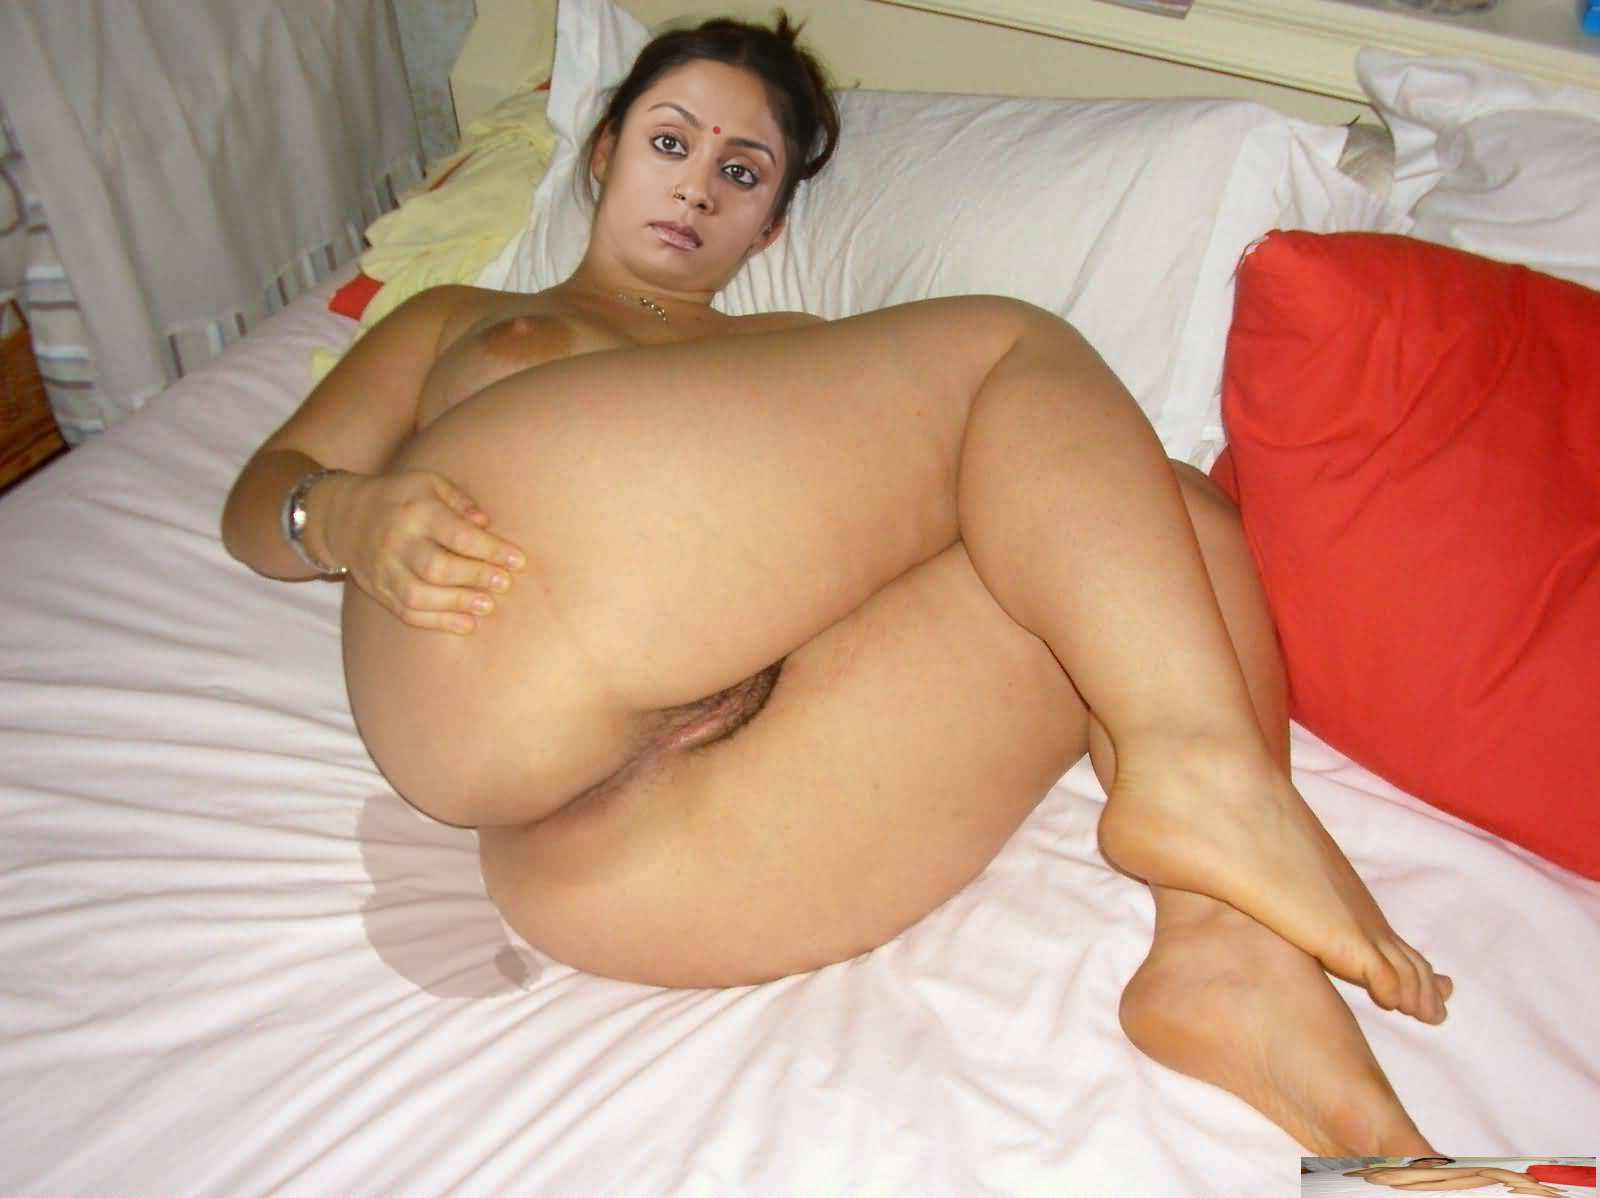 Big Woman Nude 112